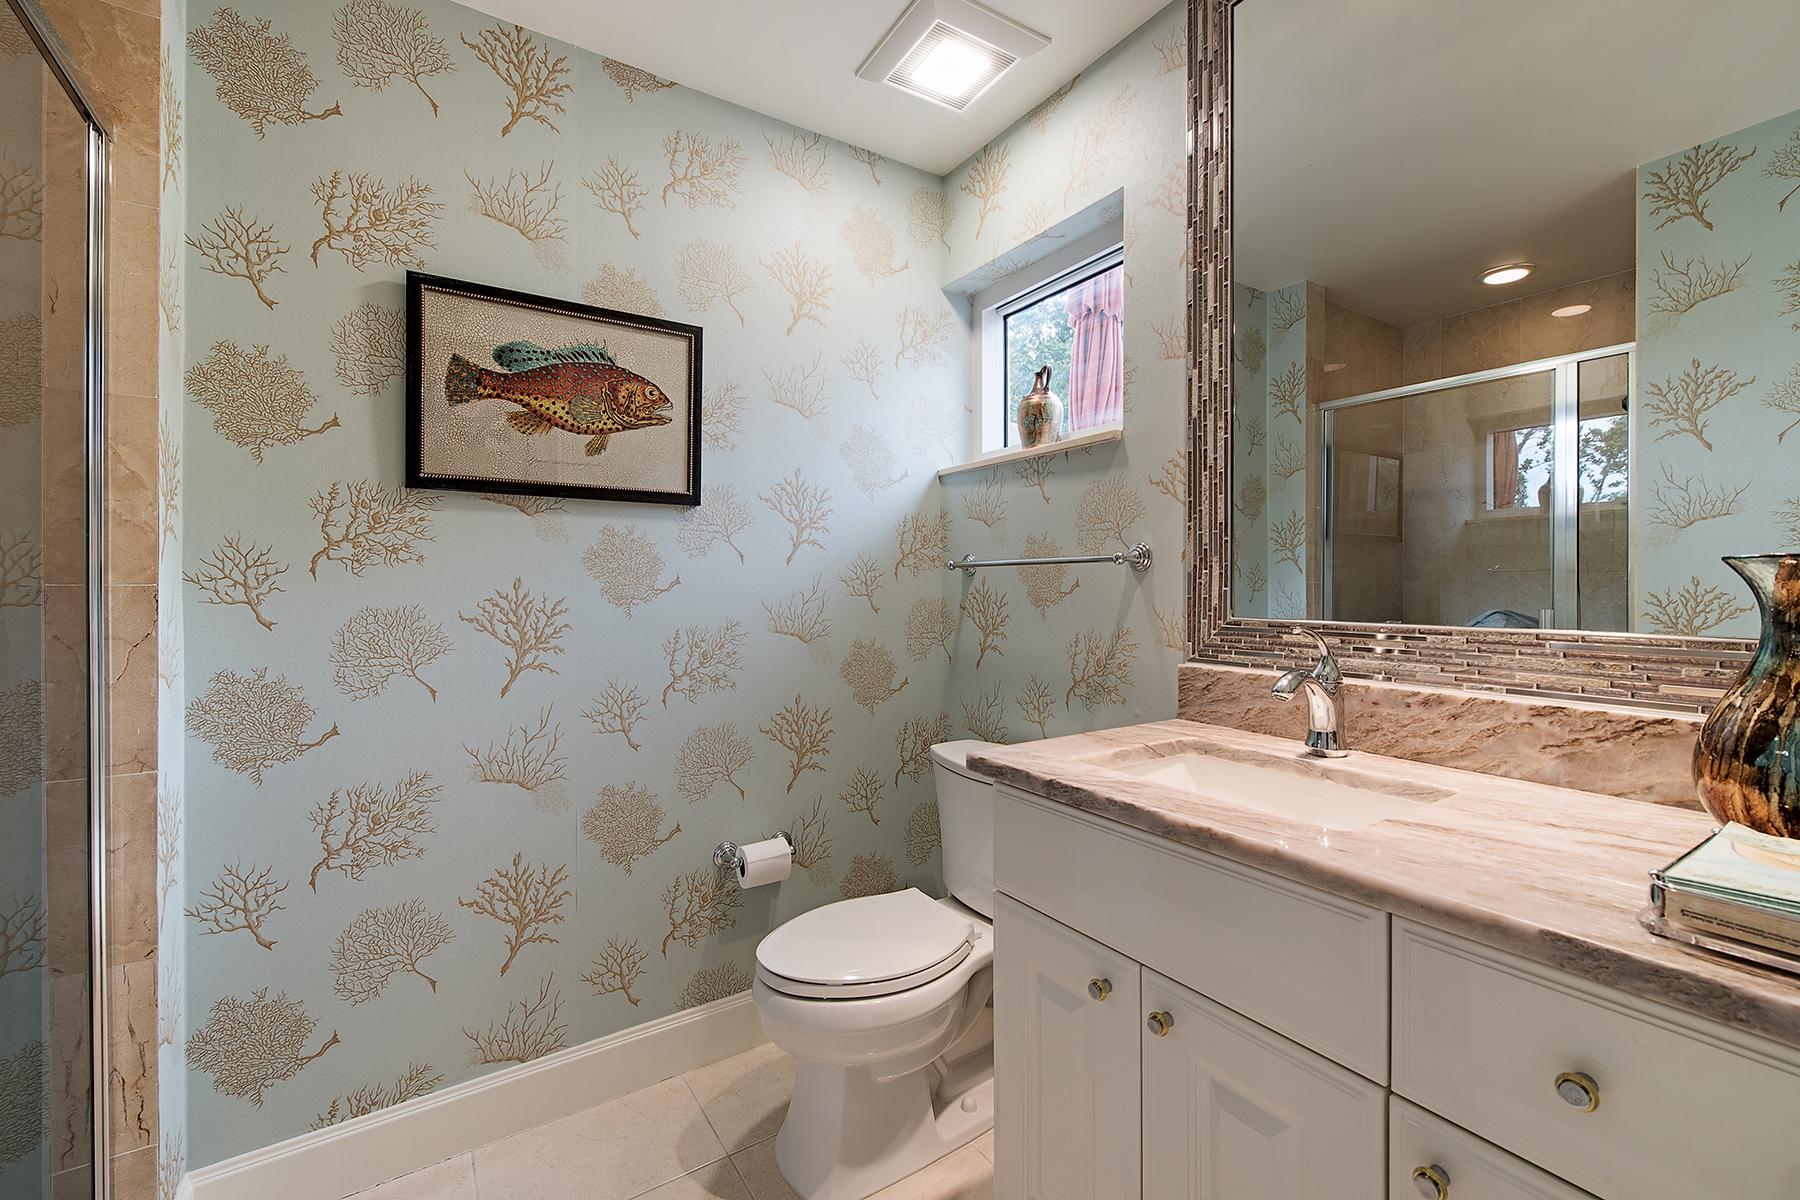 Additional photo for property listing at Pelican Bay - Cap Ferrat 6597  Nicholas Blvd 1606,  Naples, Florida 34108 United States